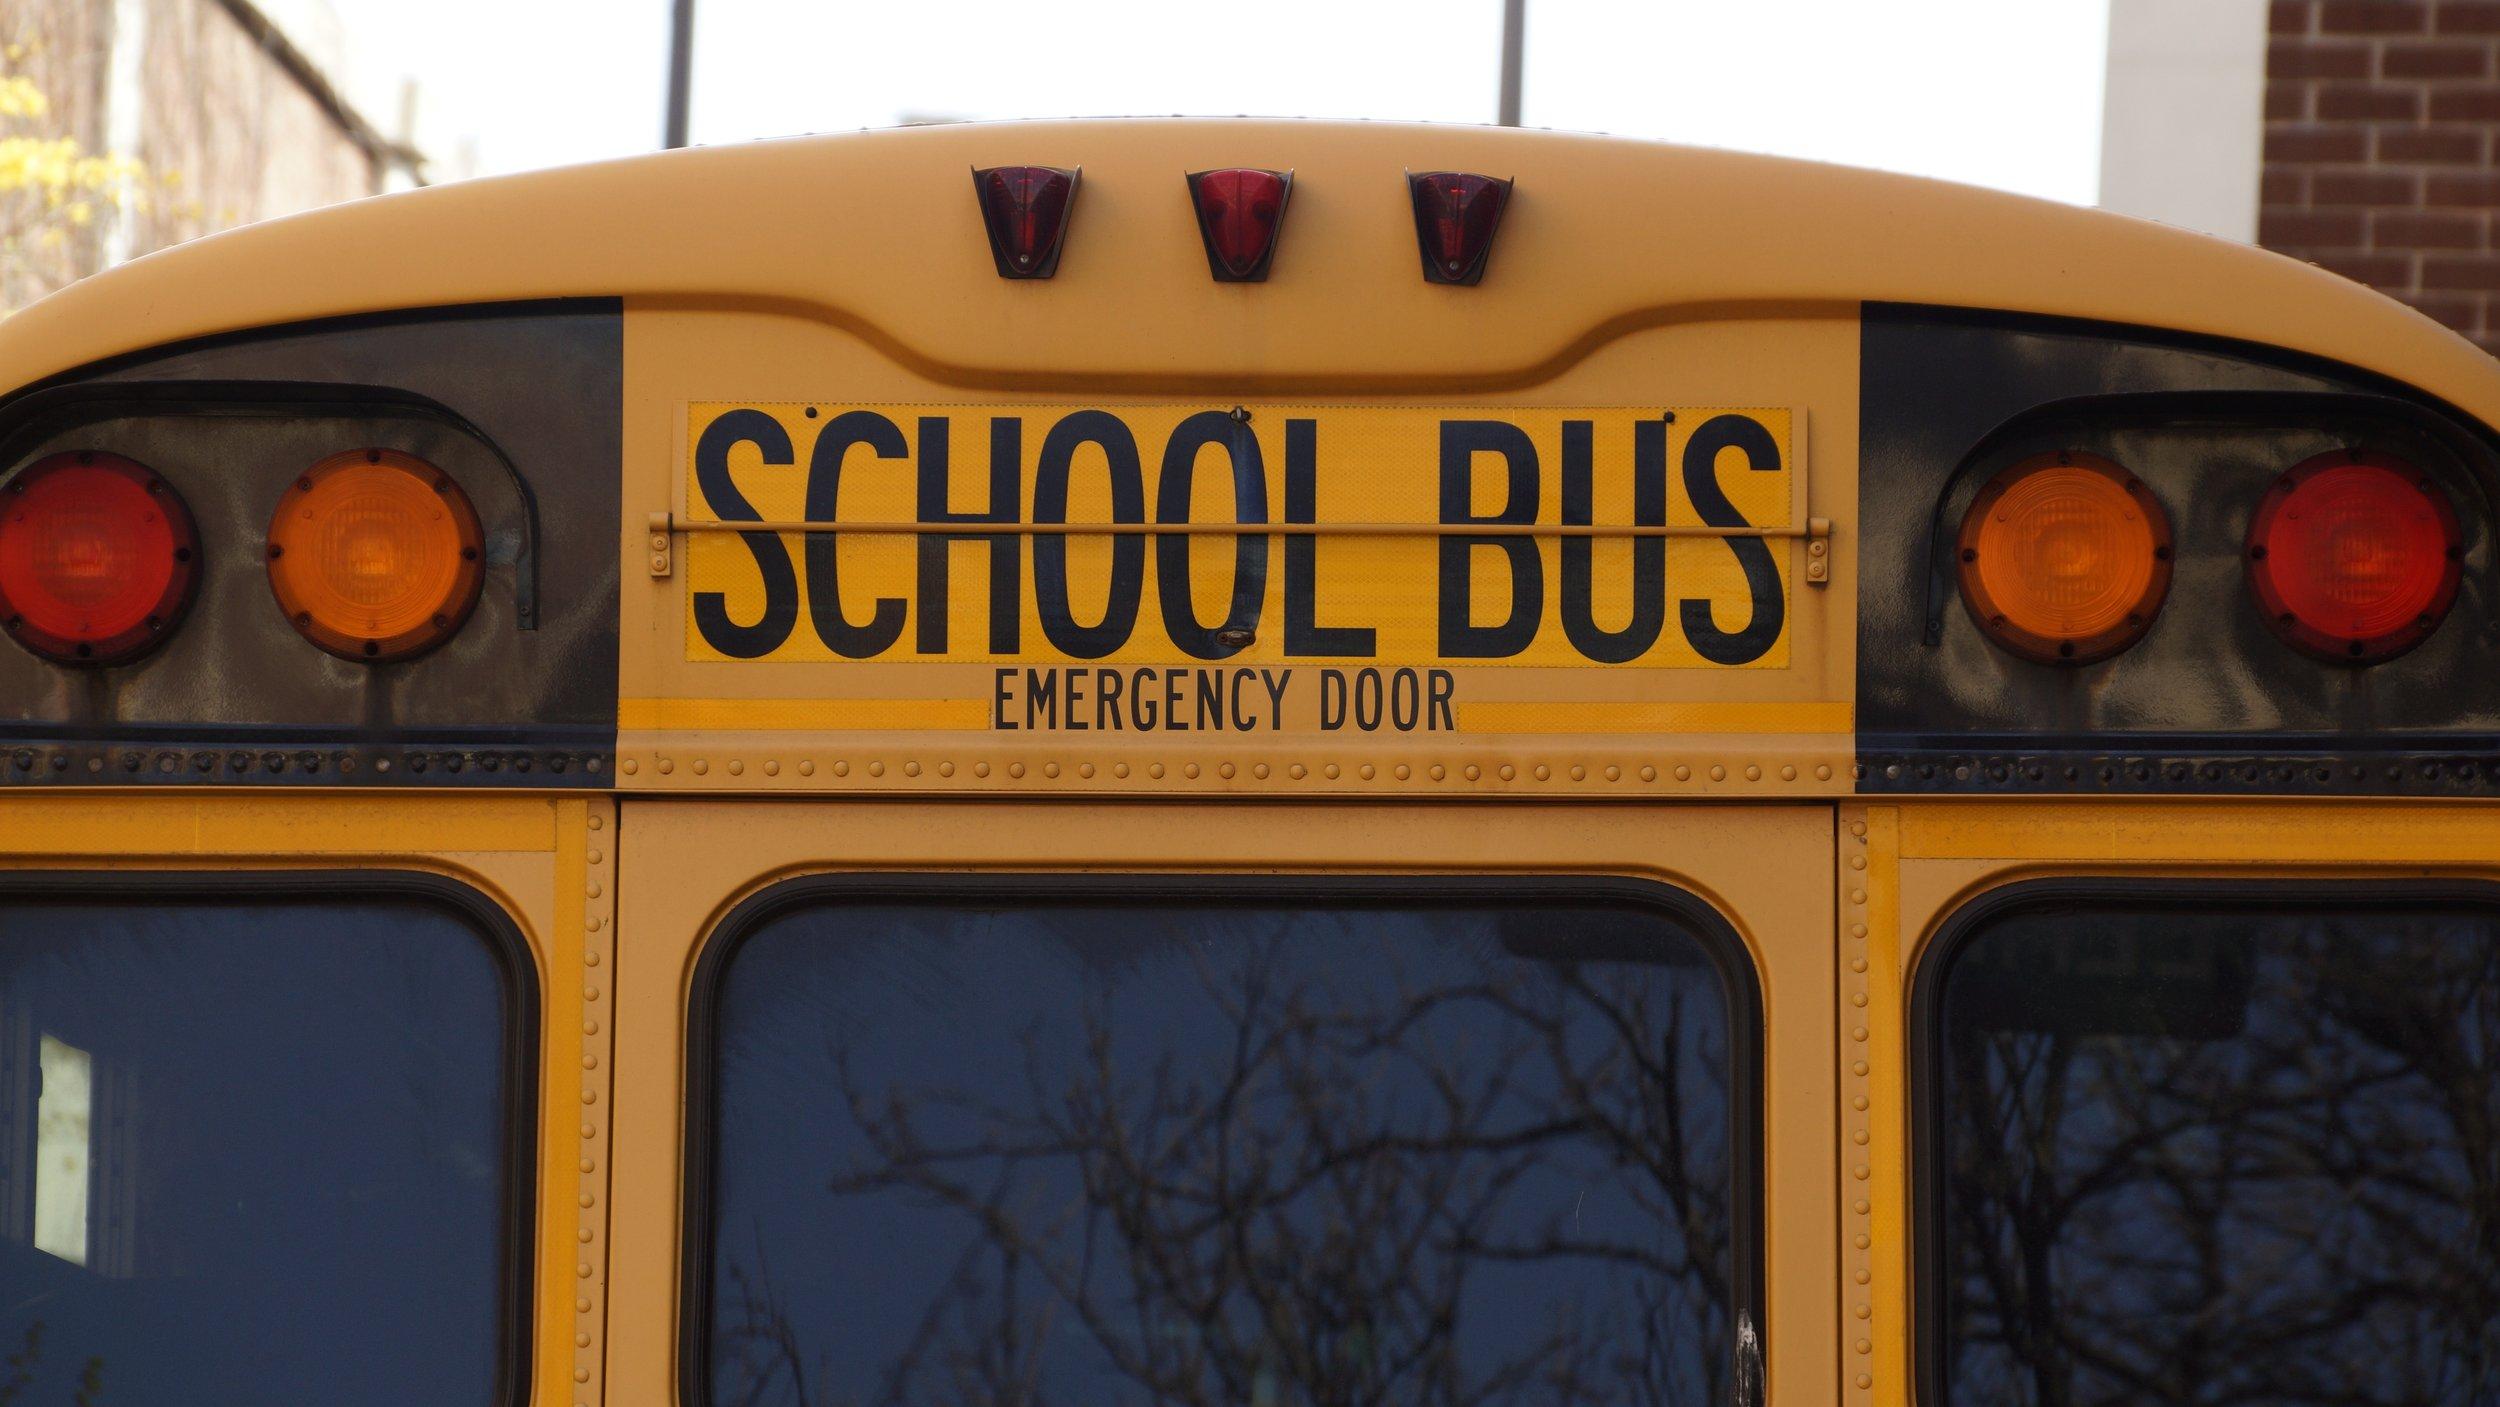 back-bus-education-159658 (1).jpg